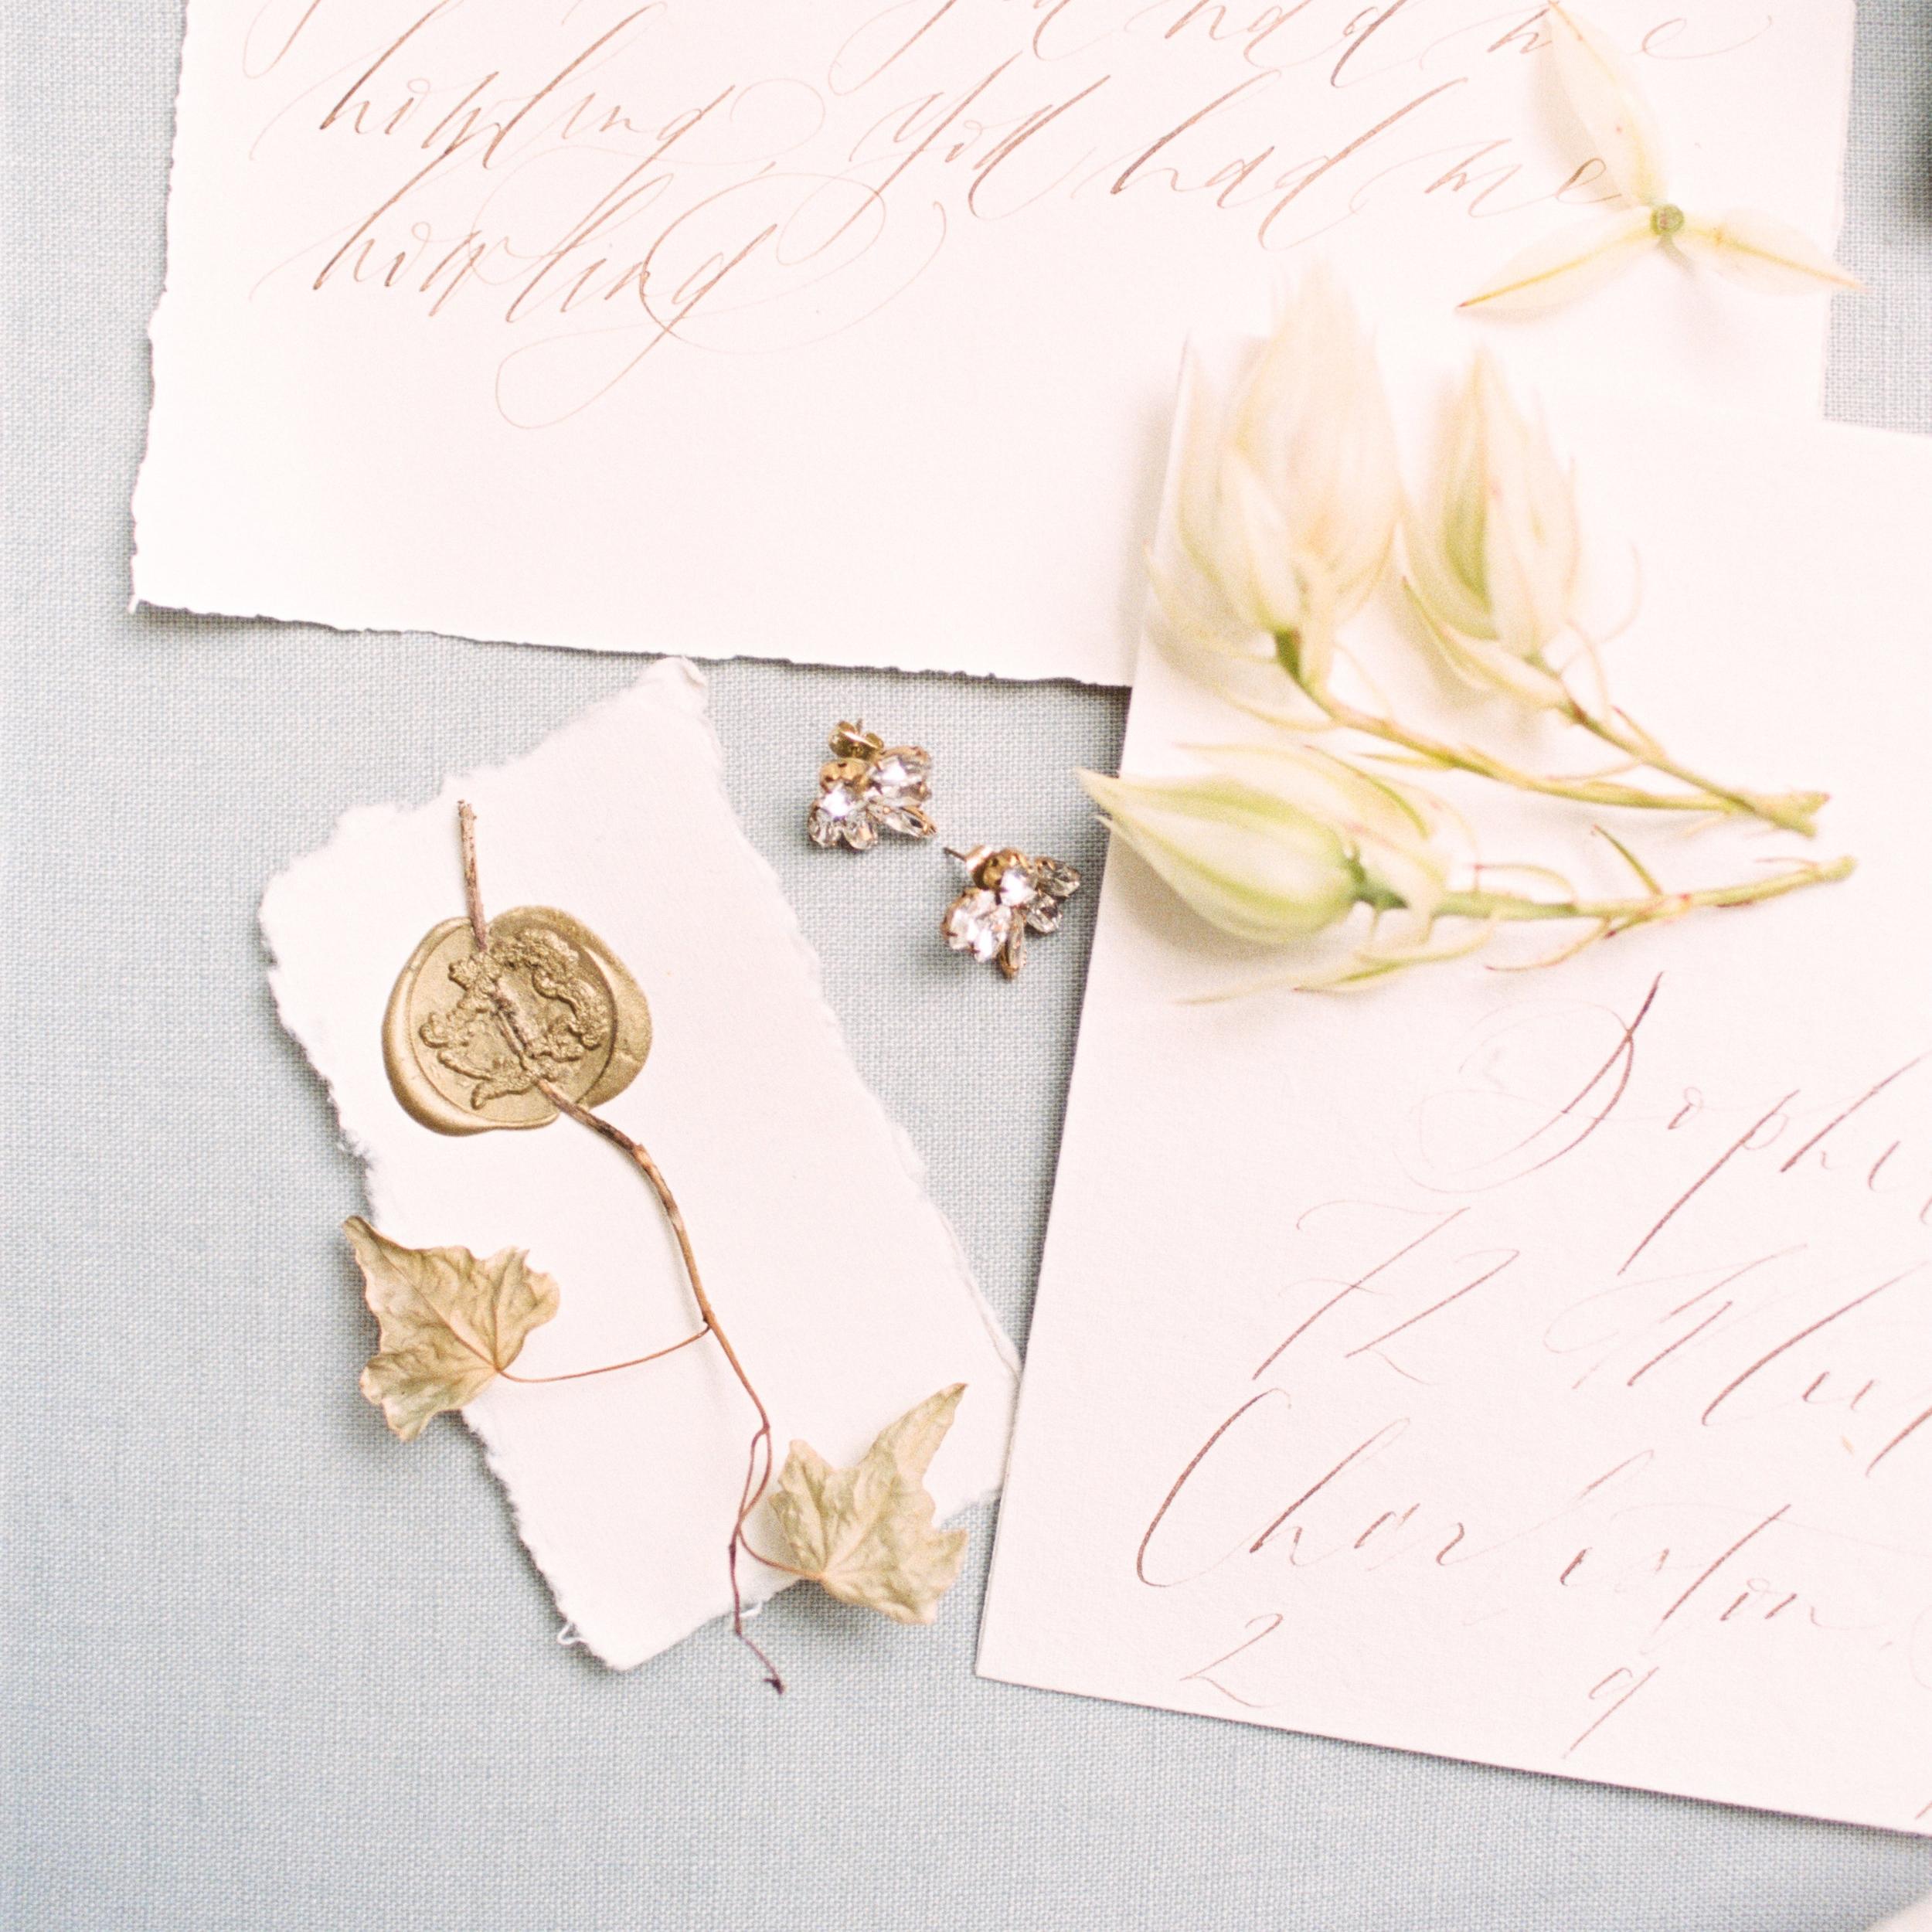 Wax Seal - Semi Custom Calligraphy Wedding Invitations | Shotgunning for Love Letters, Baltimore, MD